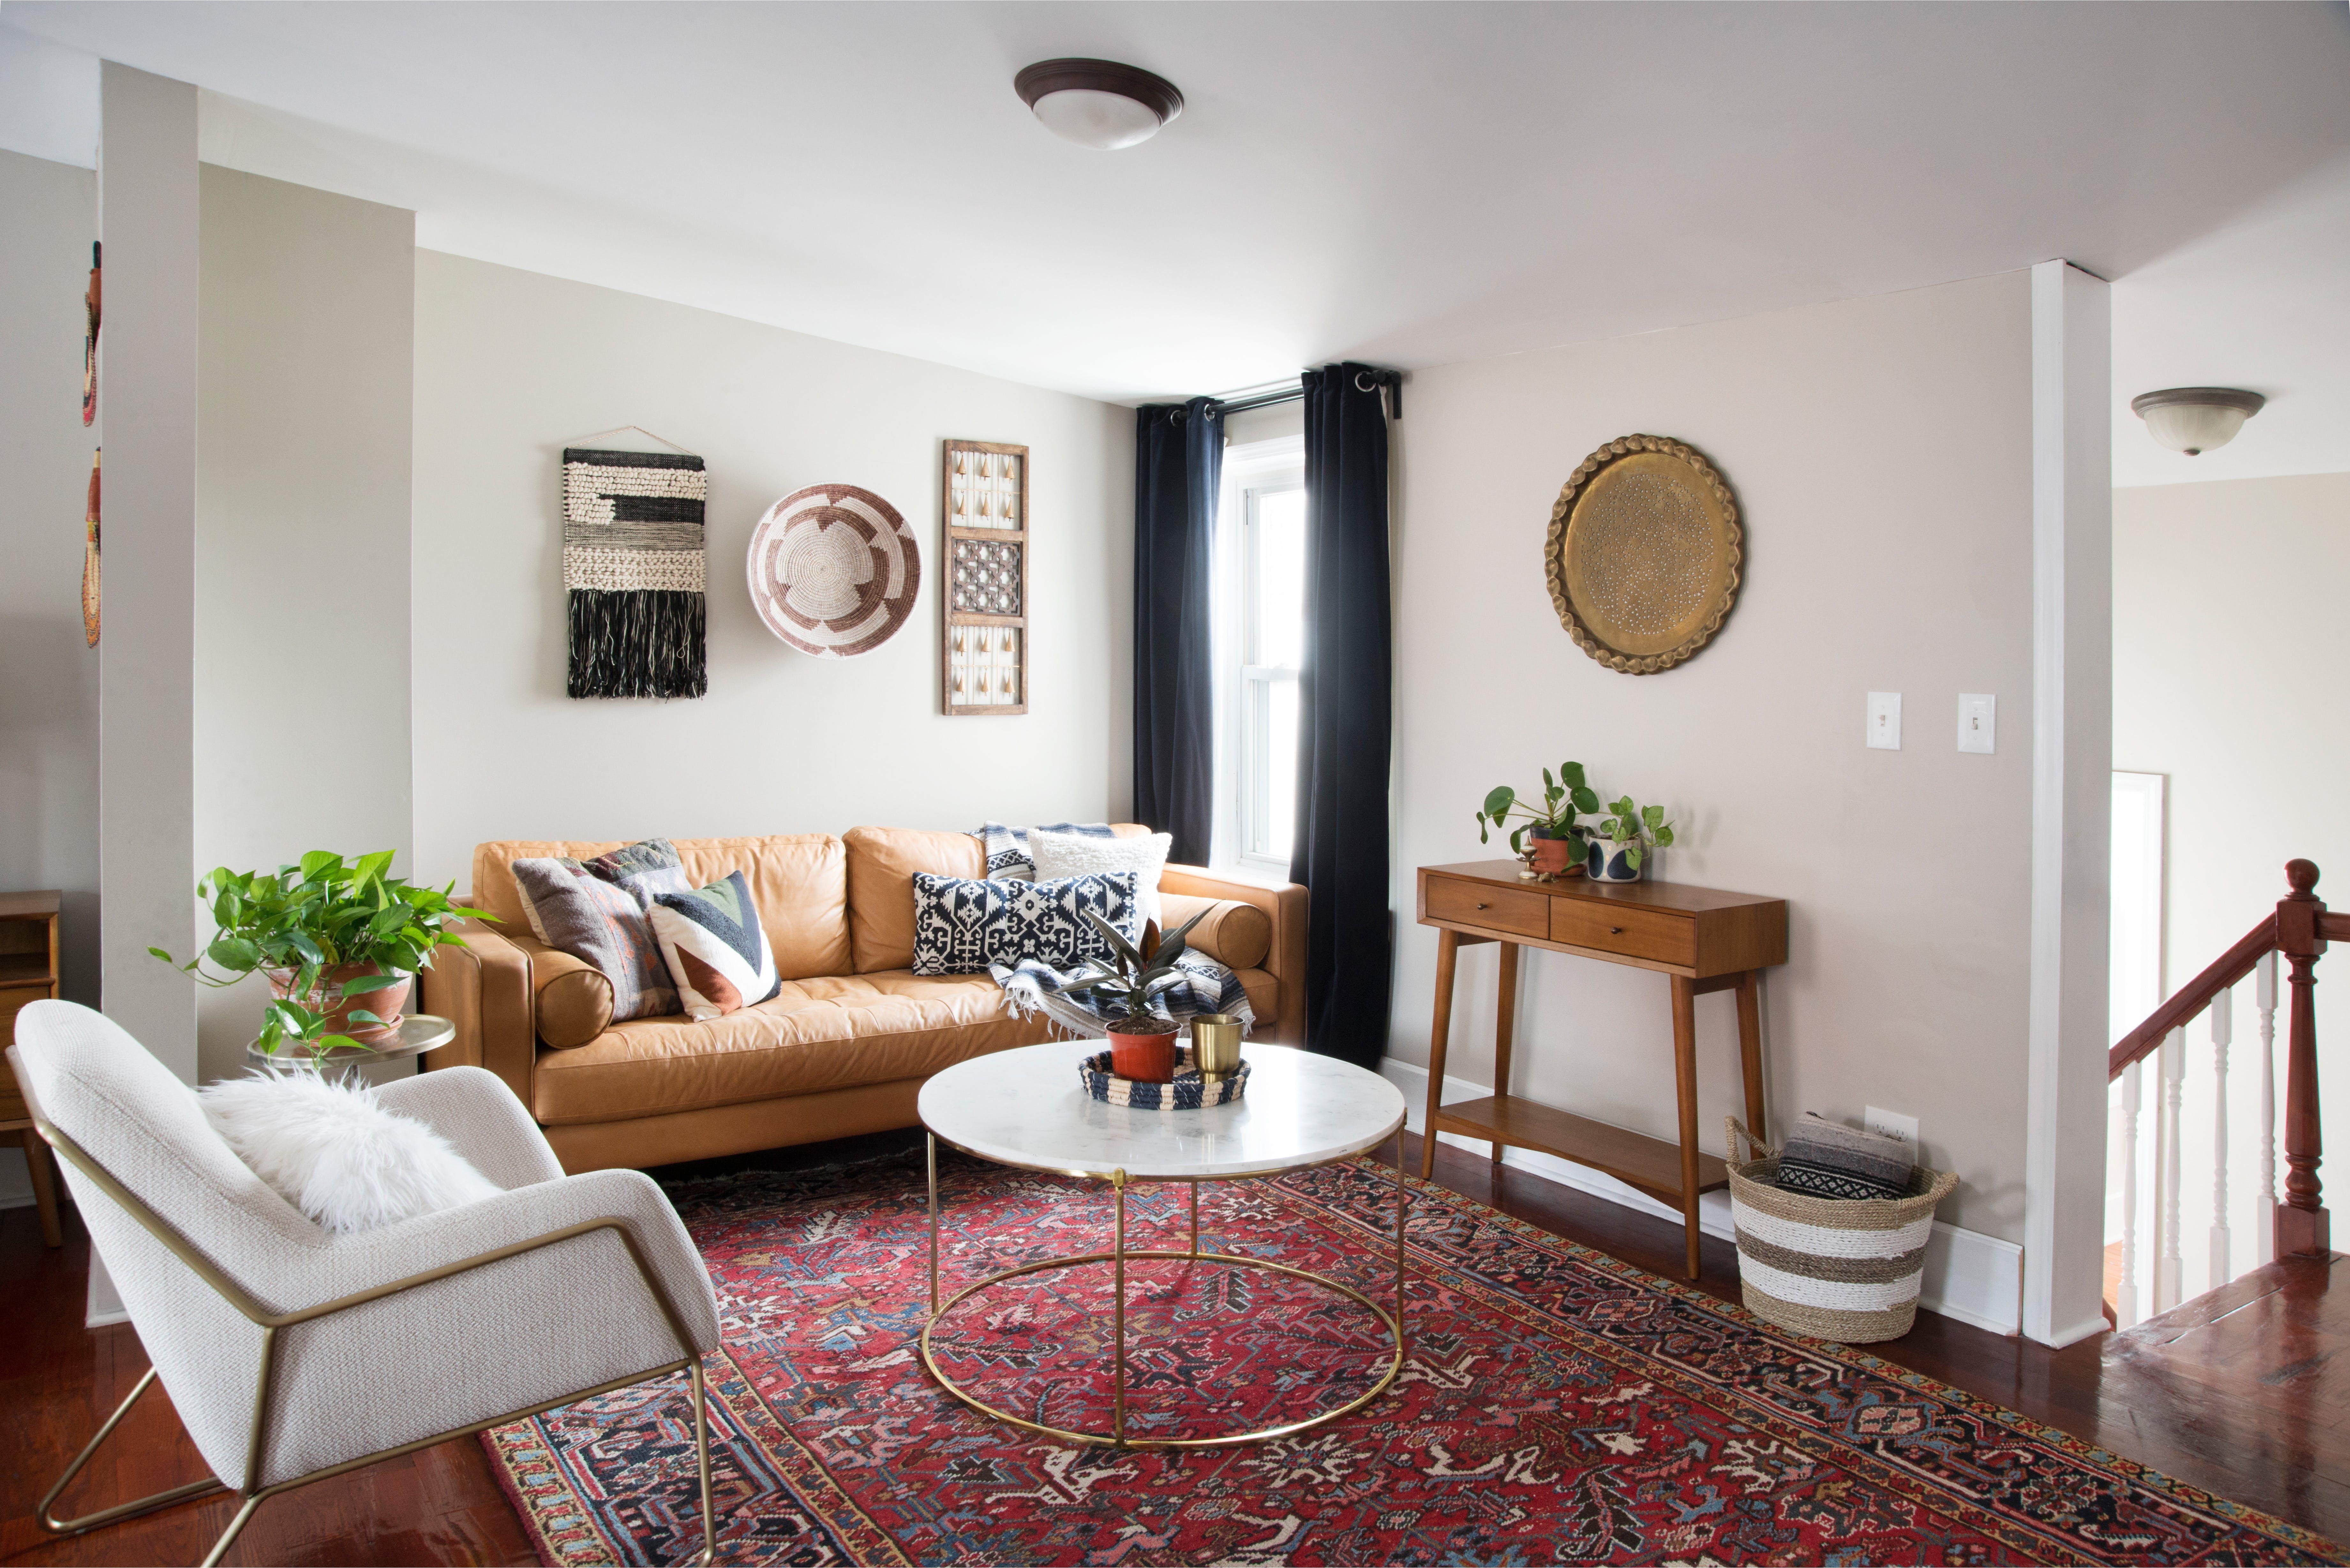 An 1860s Philadelphia Row Home Aces The Retro Eclectic Look Home Living Room Home Easy Home Decor #row #home #living #room #ideas